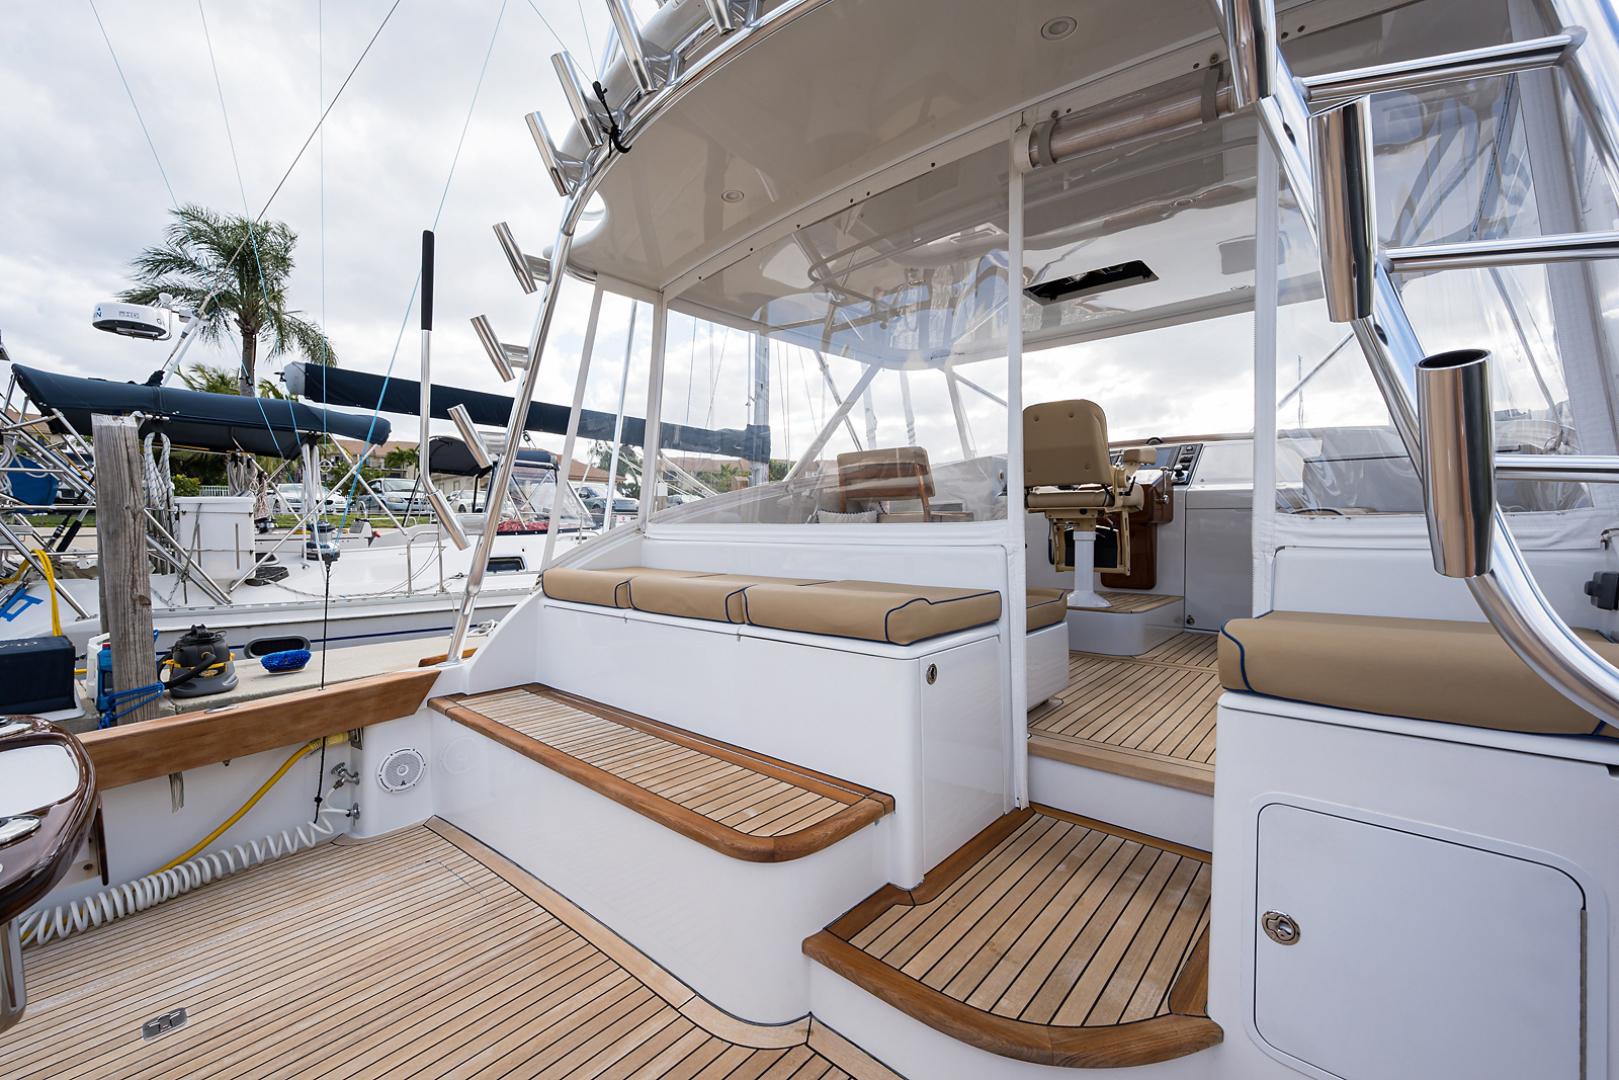 Release-One-of-A-Kind Custom Express 2014-Gladiator Jupiter-Florida-United States-Cockpit-1370111   Thumbnail